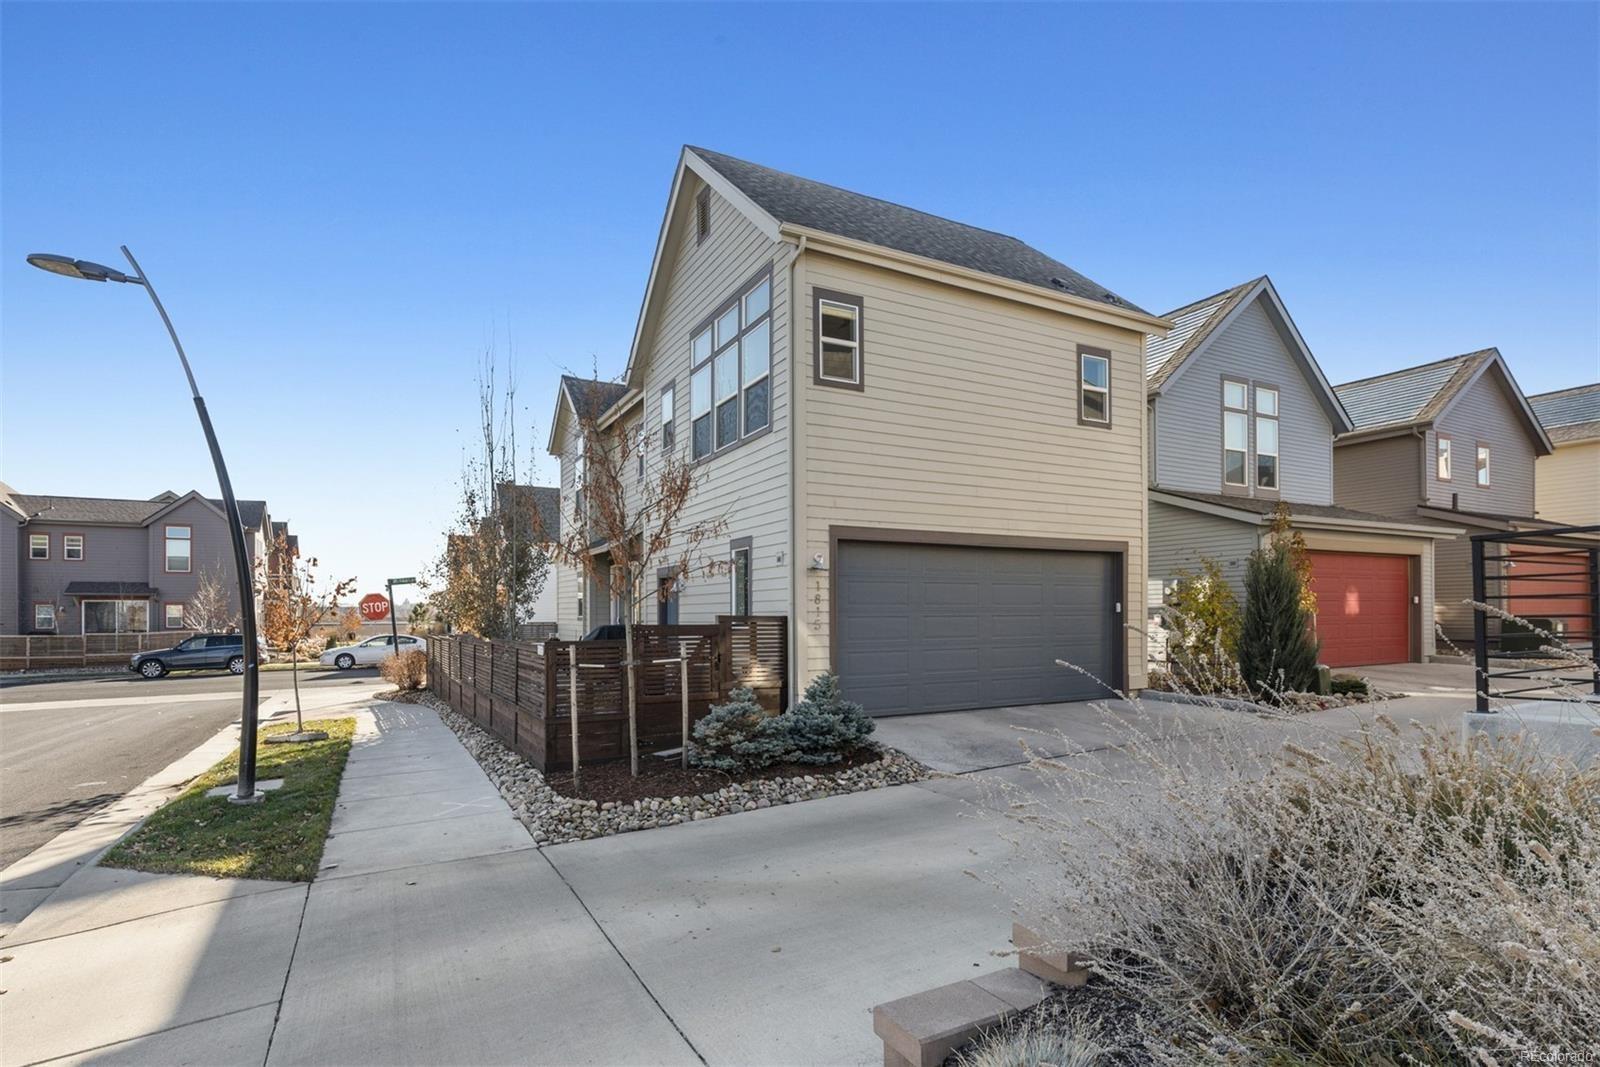 MLS# 9485406 - 1 - 1815  W 66th Avenue, Denver, CO 80221